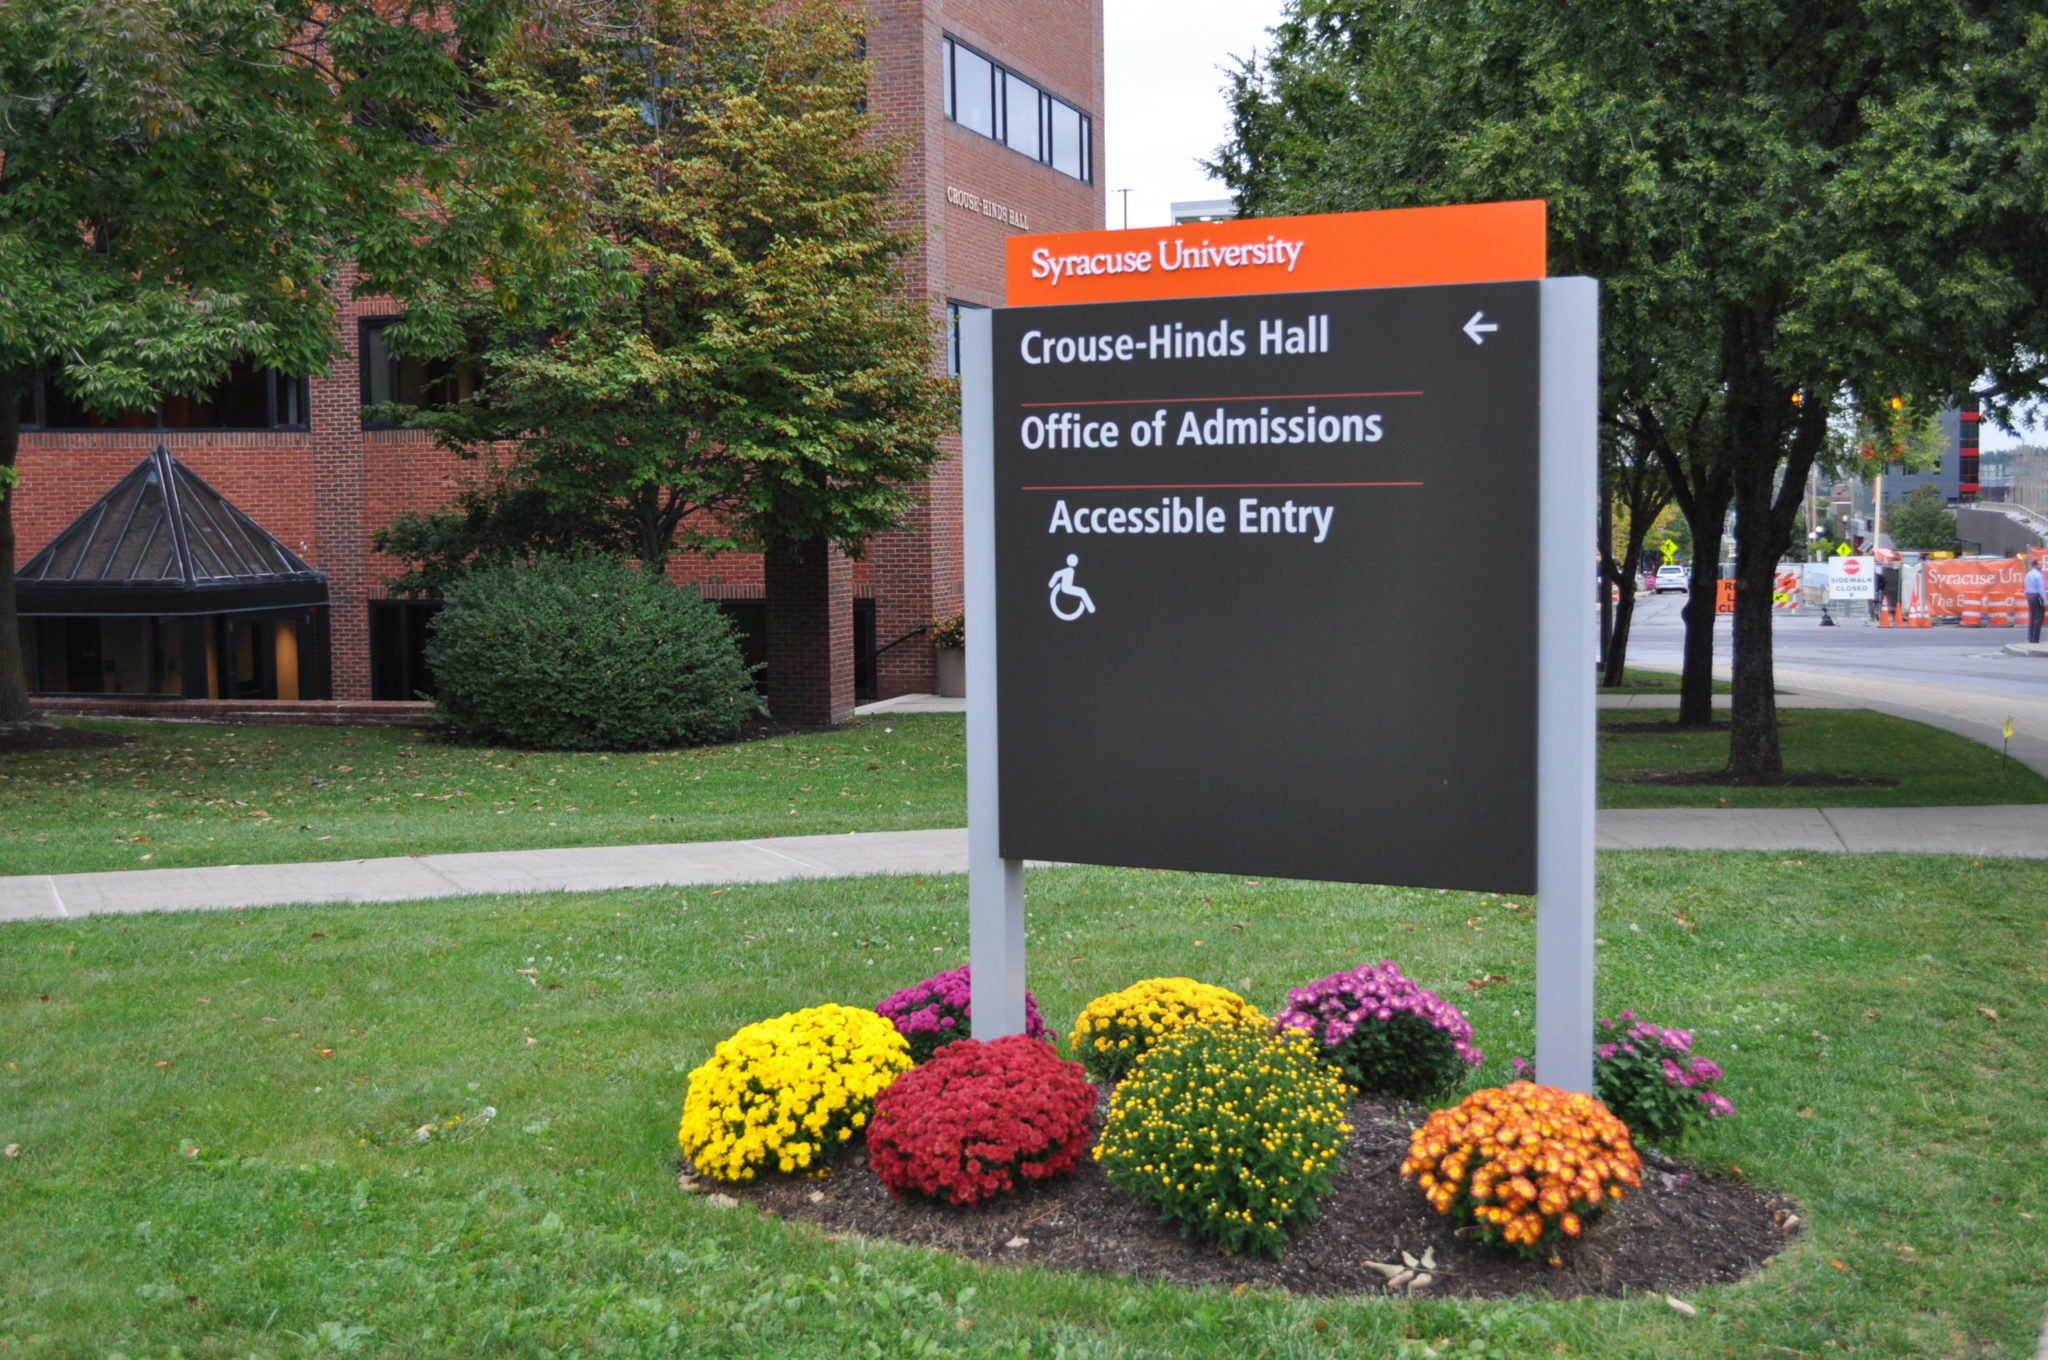 Syracuse University exterior wayfinding sign